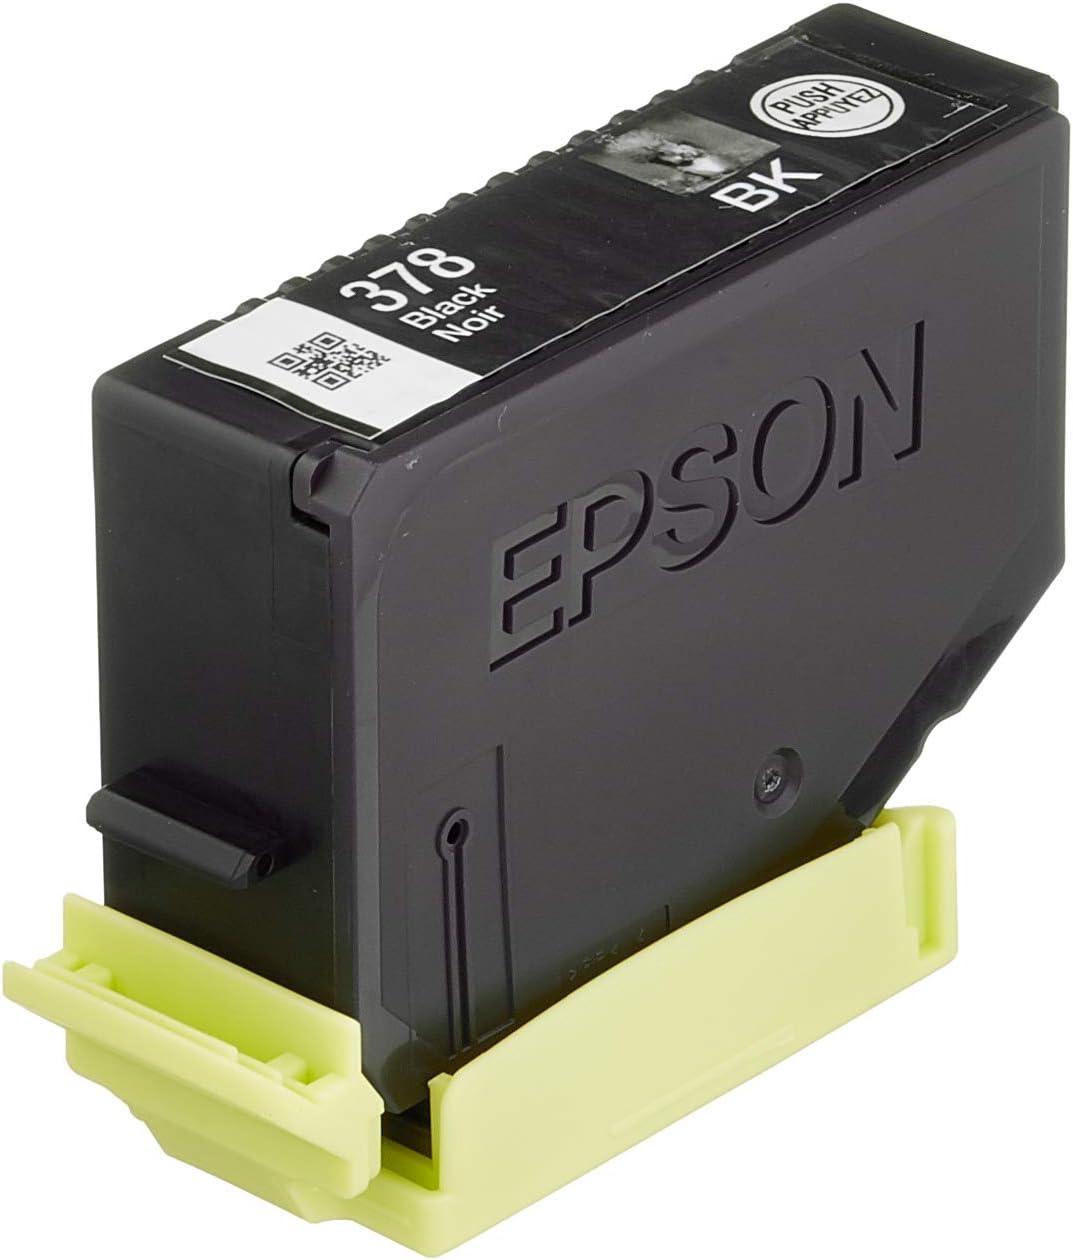 Epson Original 378 Tinte Eichhörnchen Xp 8500 Xp 8600 Xp 8605 Xp 15000 Amazon Dash Replenishment Fähig Schwarz Bürobedarf Schreibwaren